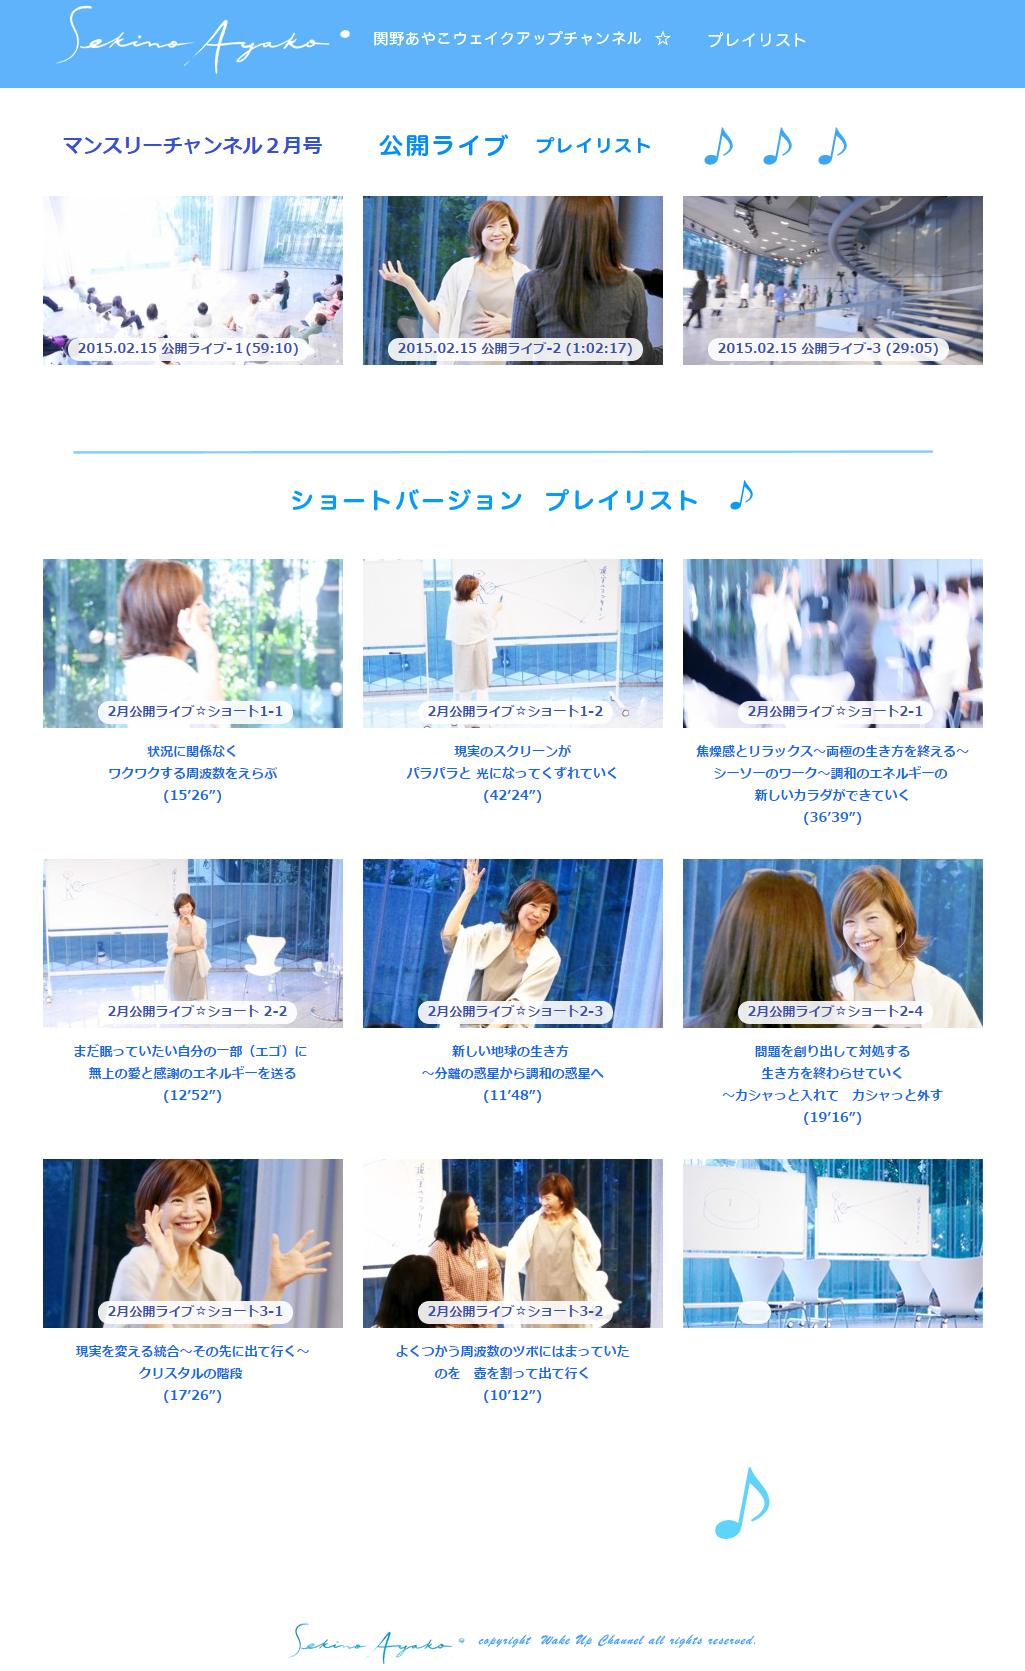 screencapture-sekinoayako-com-playlist-monthly-2015-02z2c4t